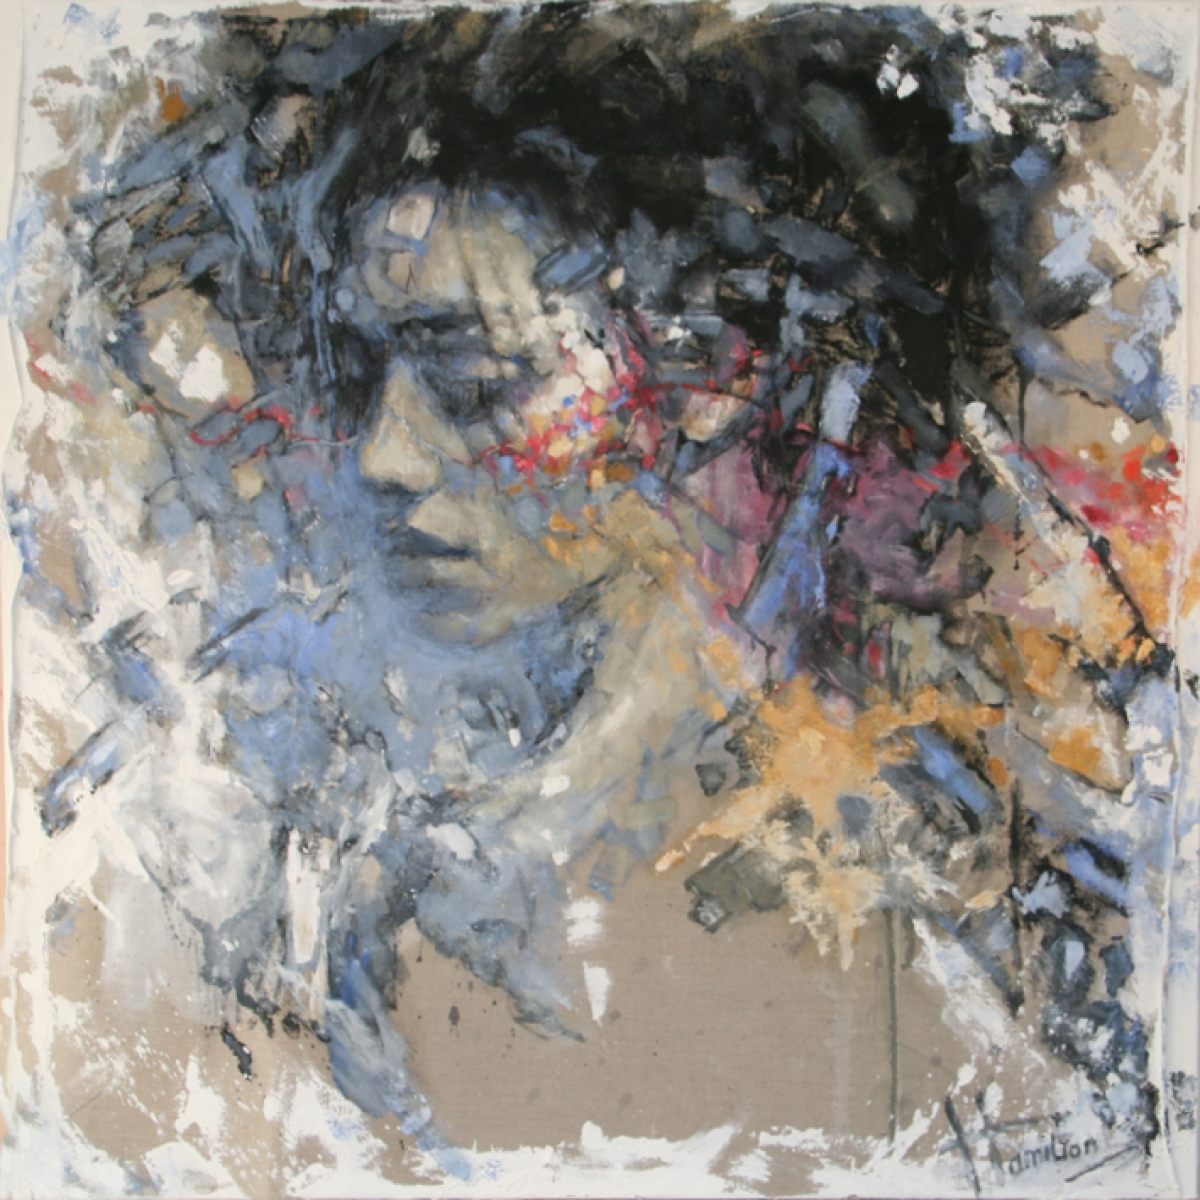 Kunst: She van kunstenaar Evelyn Hamilton